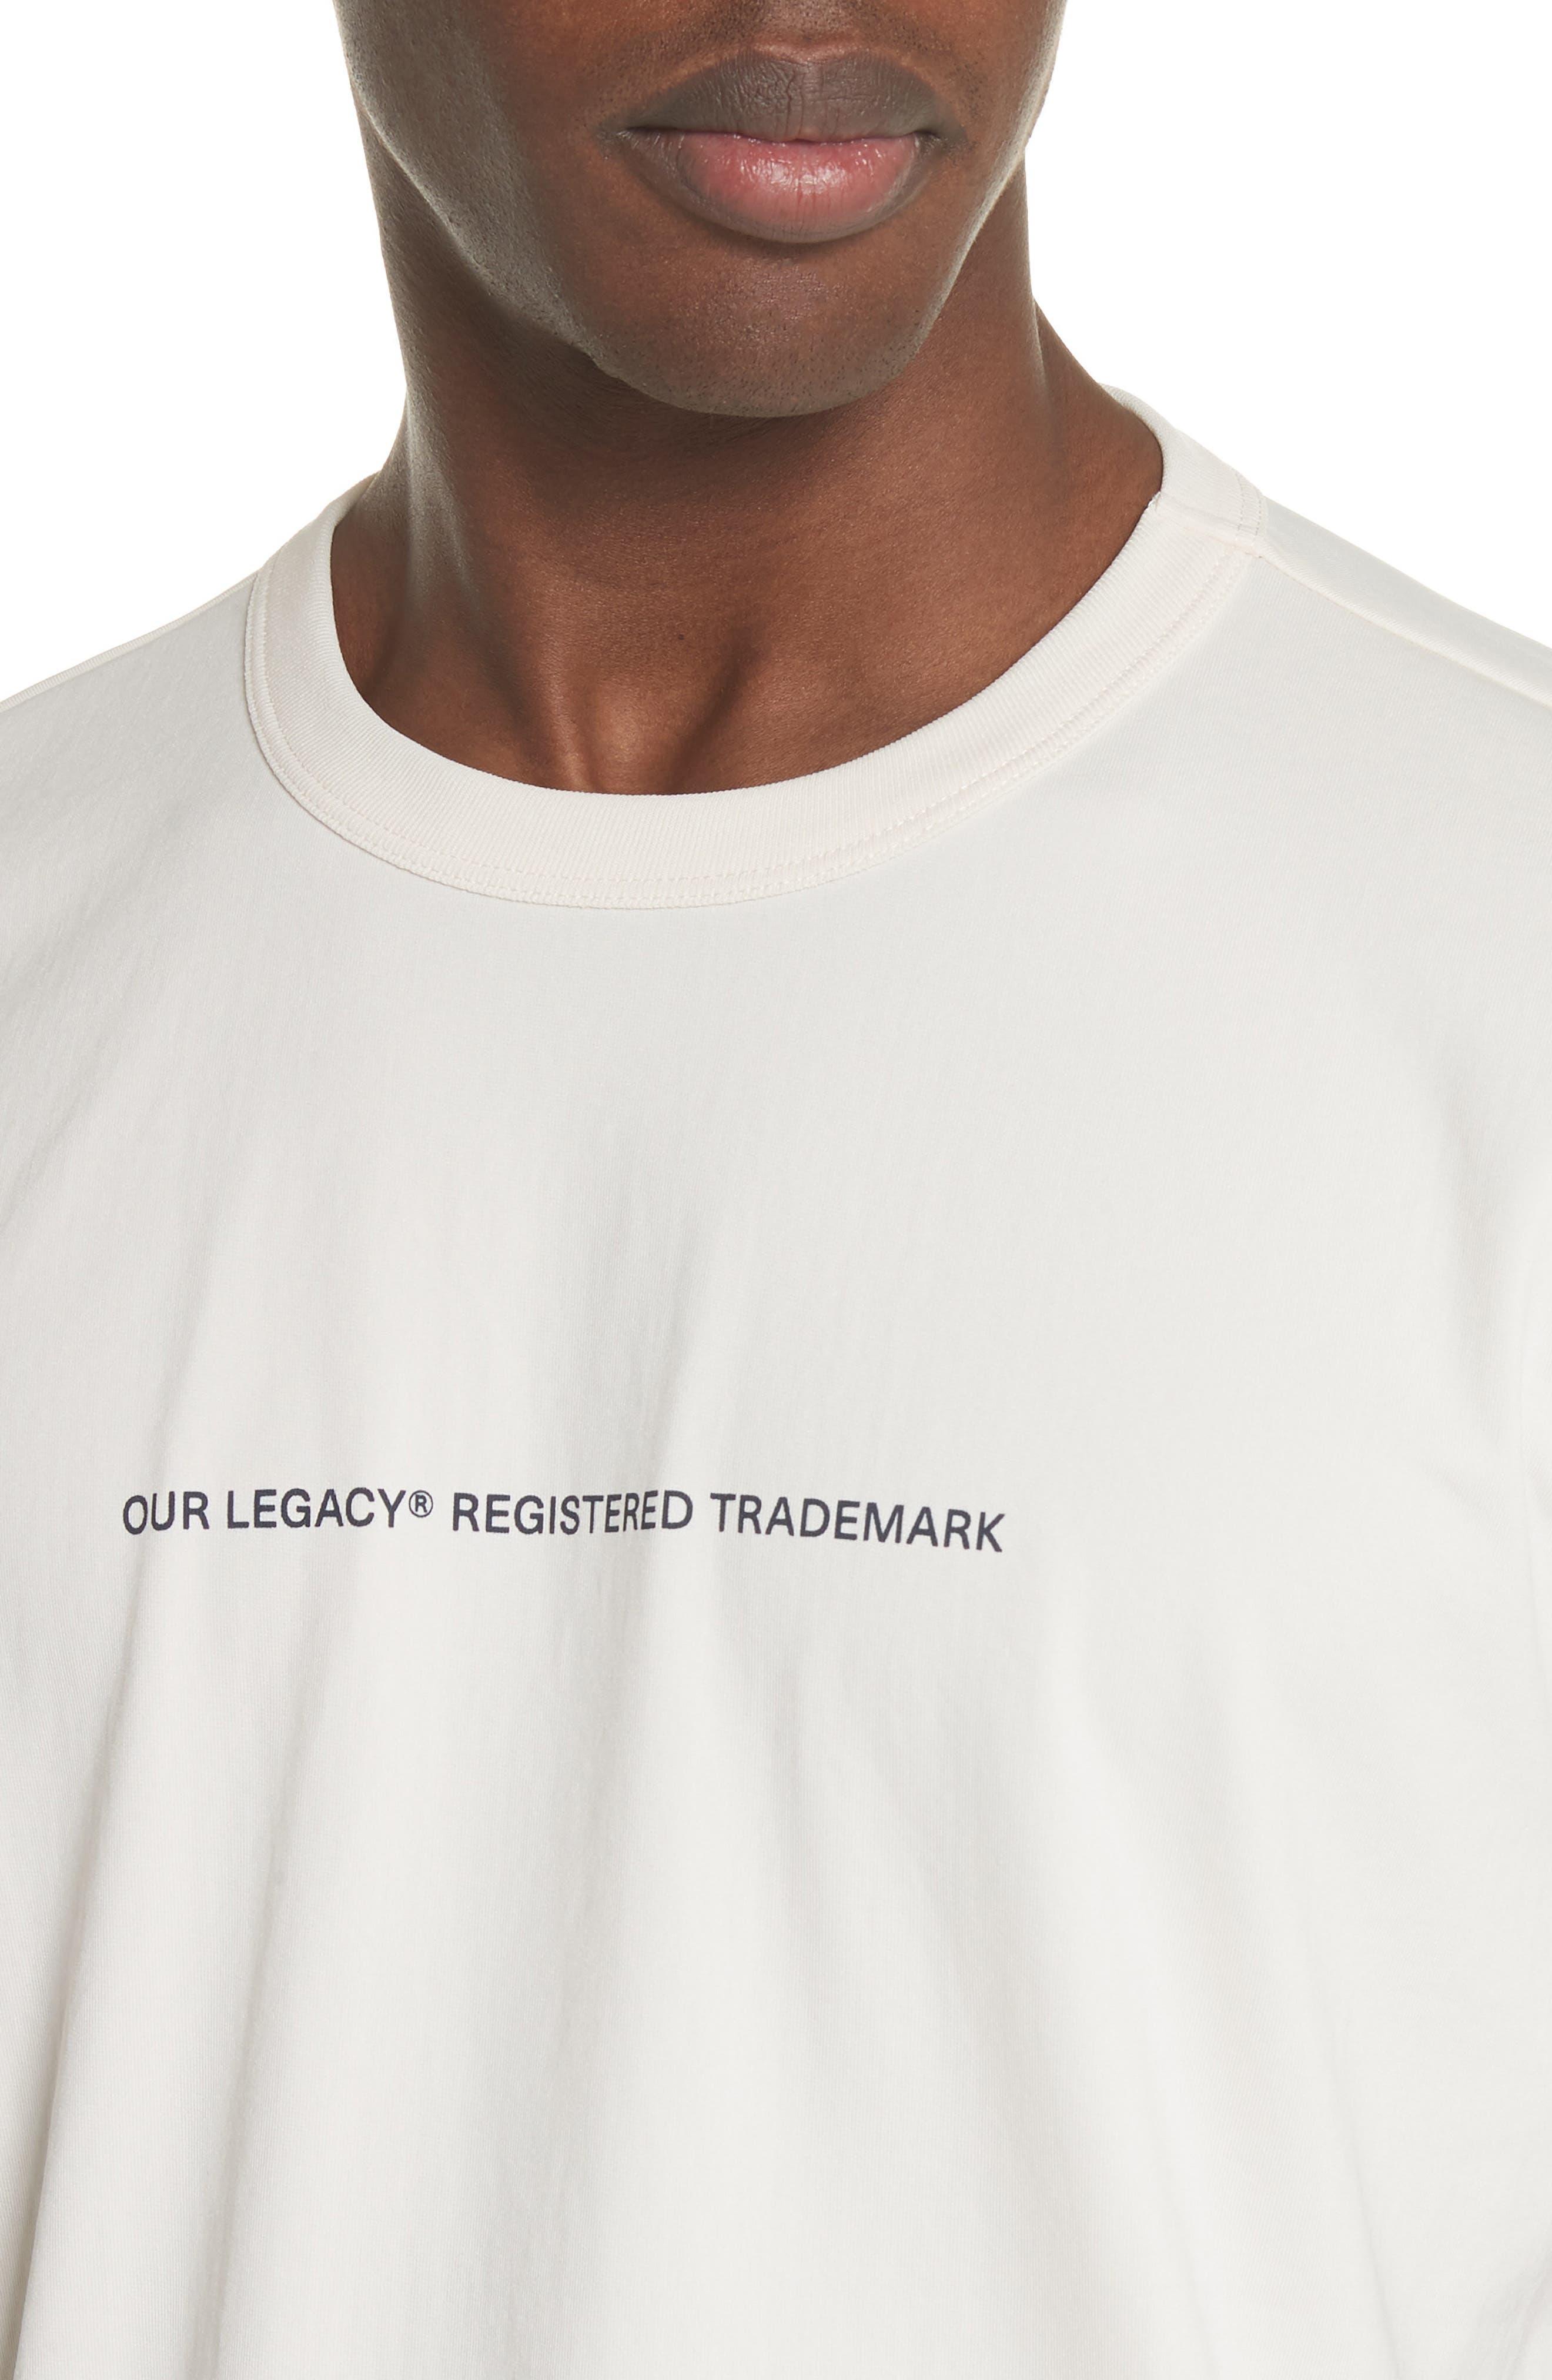 Trademark Graphic T-Shirt,                             Alternate thumbnail 4, color,                             100